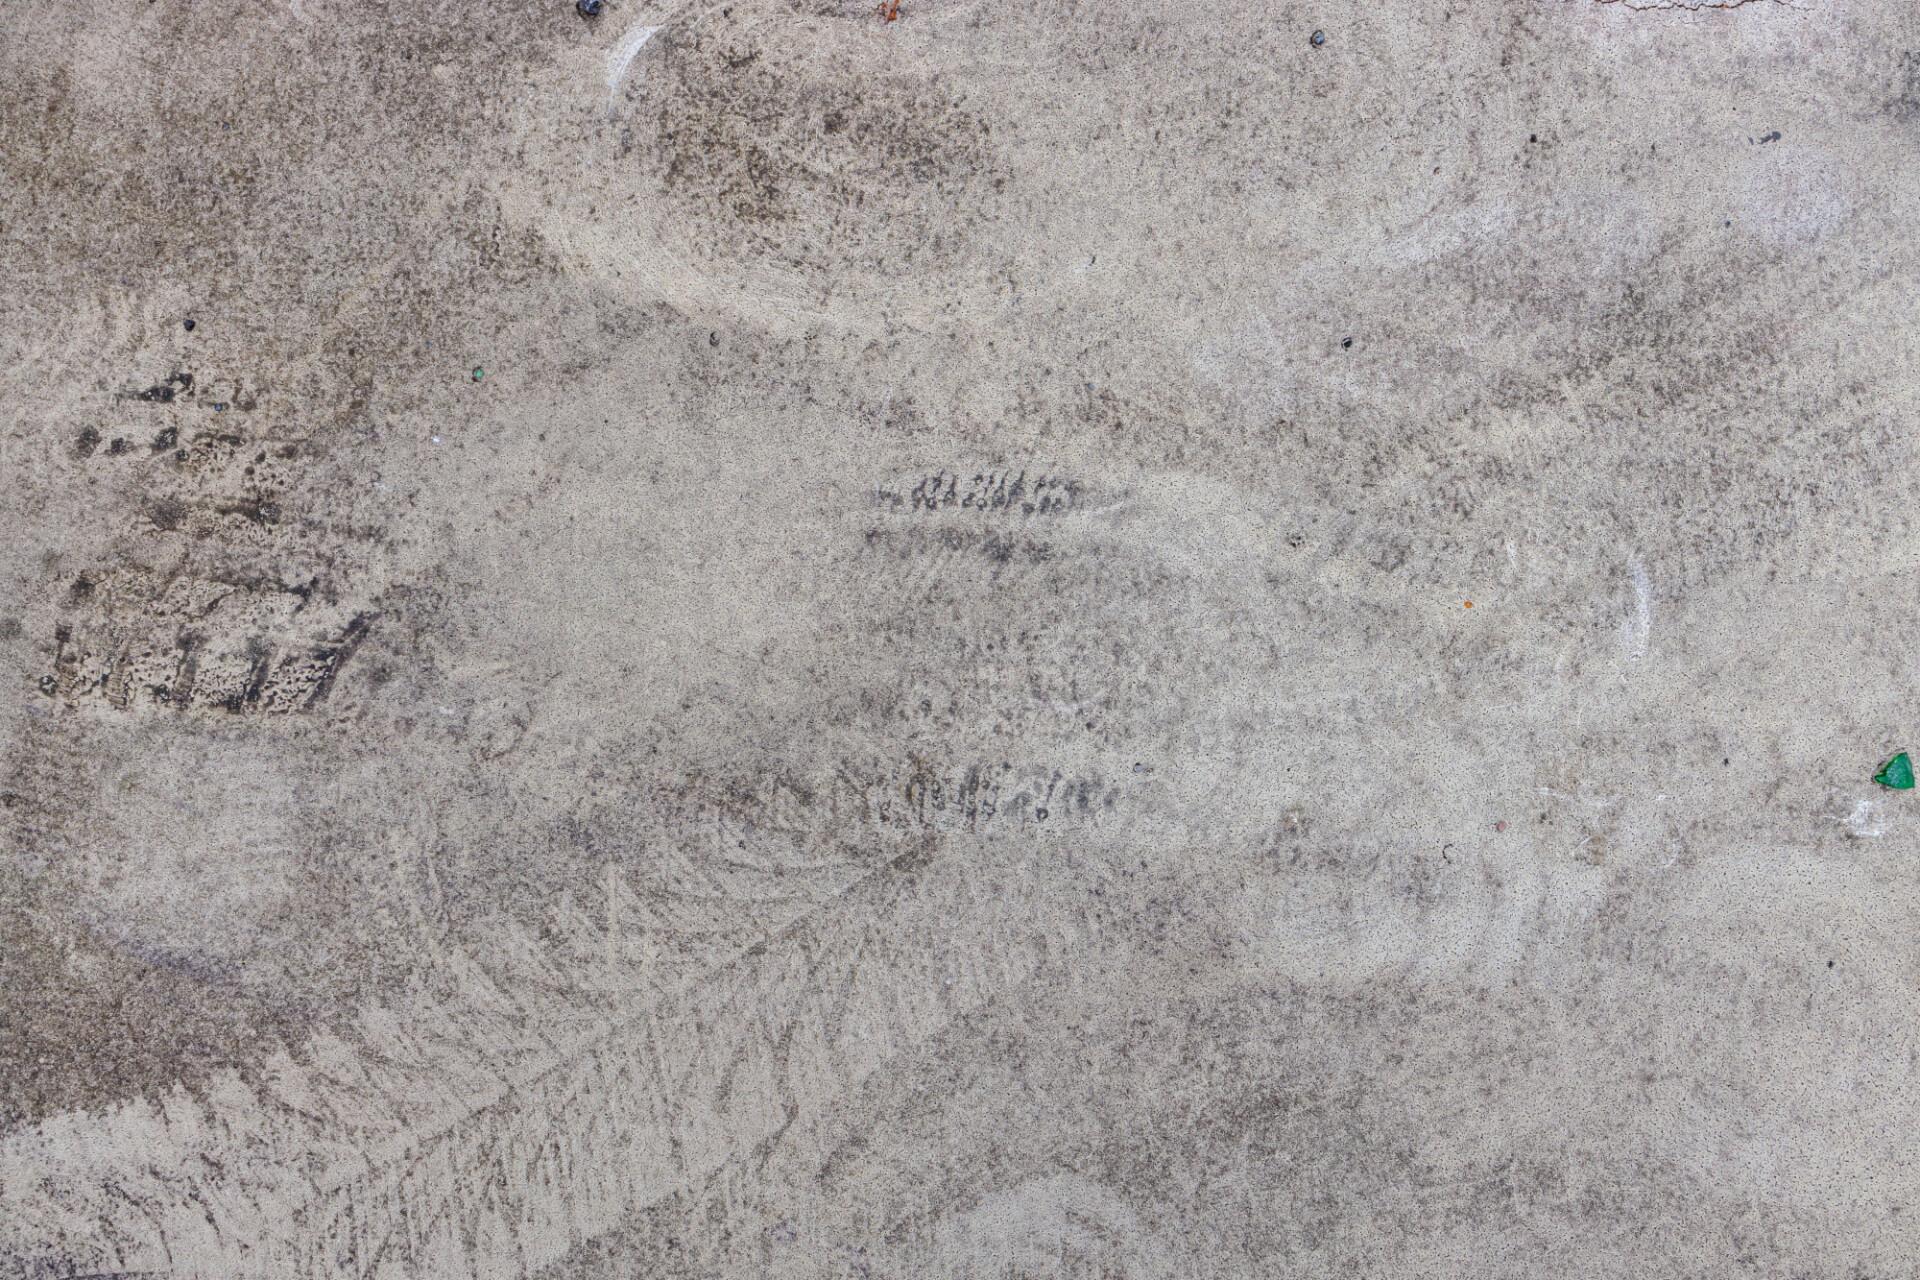 Concrete floor texture with car tyre tracks